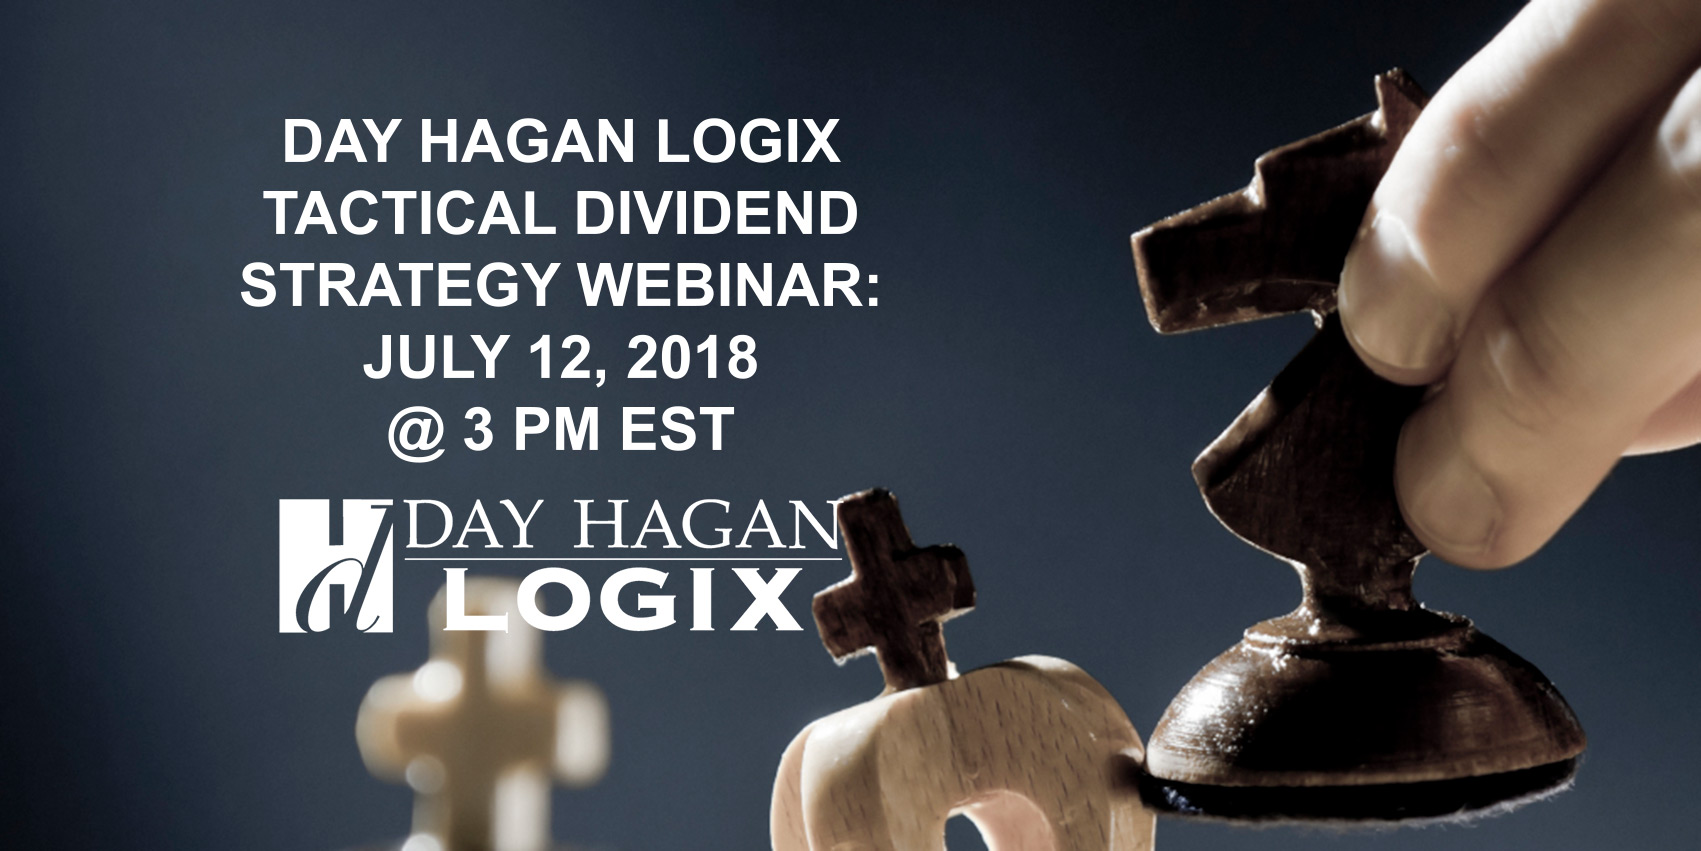 Day Hagan Logix Tactical Dividend Strategy Webinar, July 12 2018 at 3 PM EST. Register at DayHaganLogix.com.